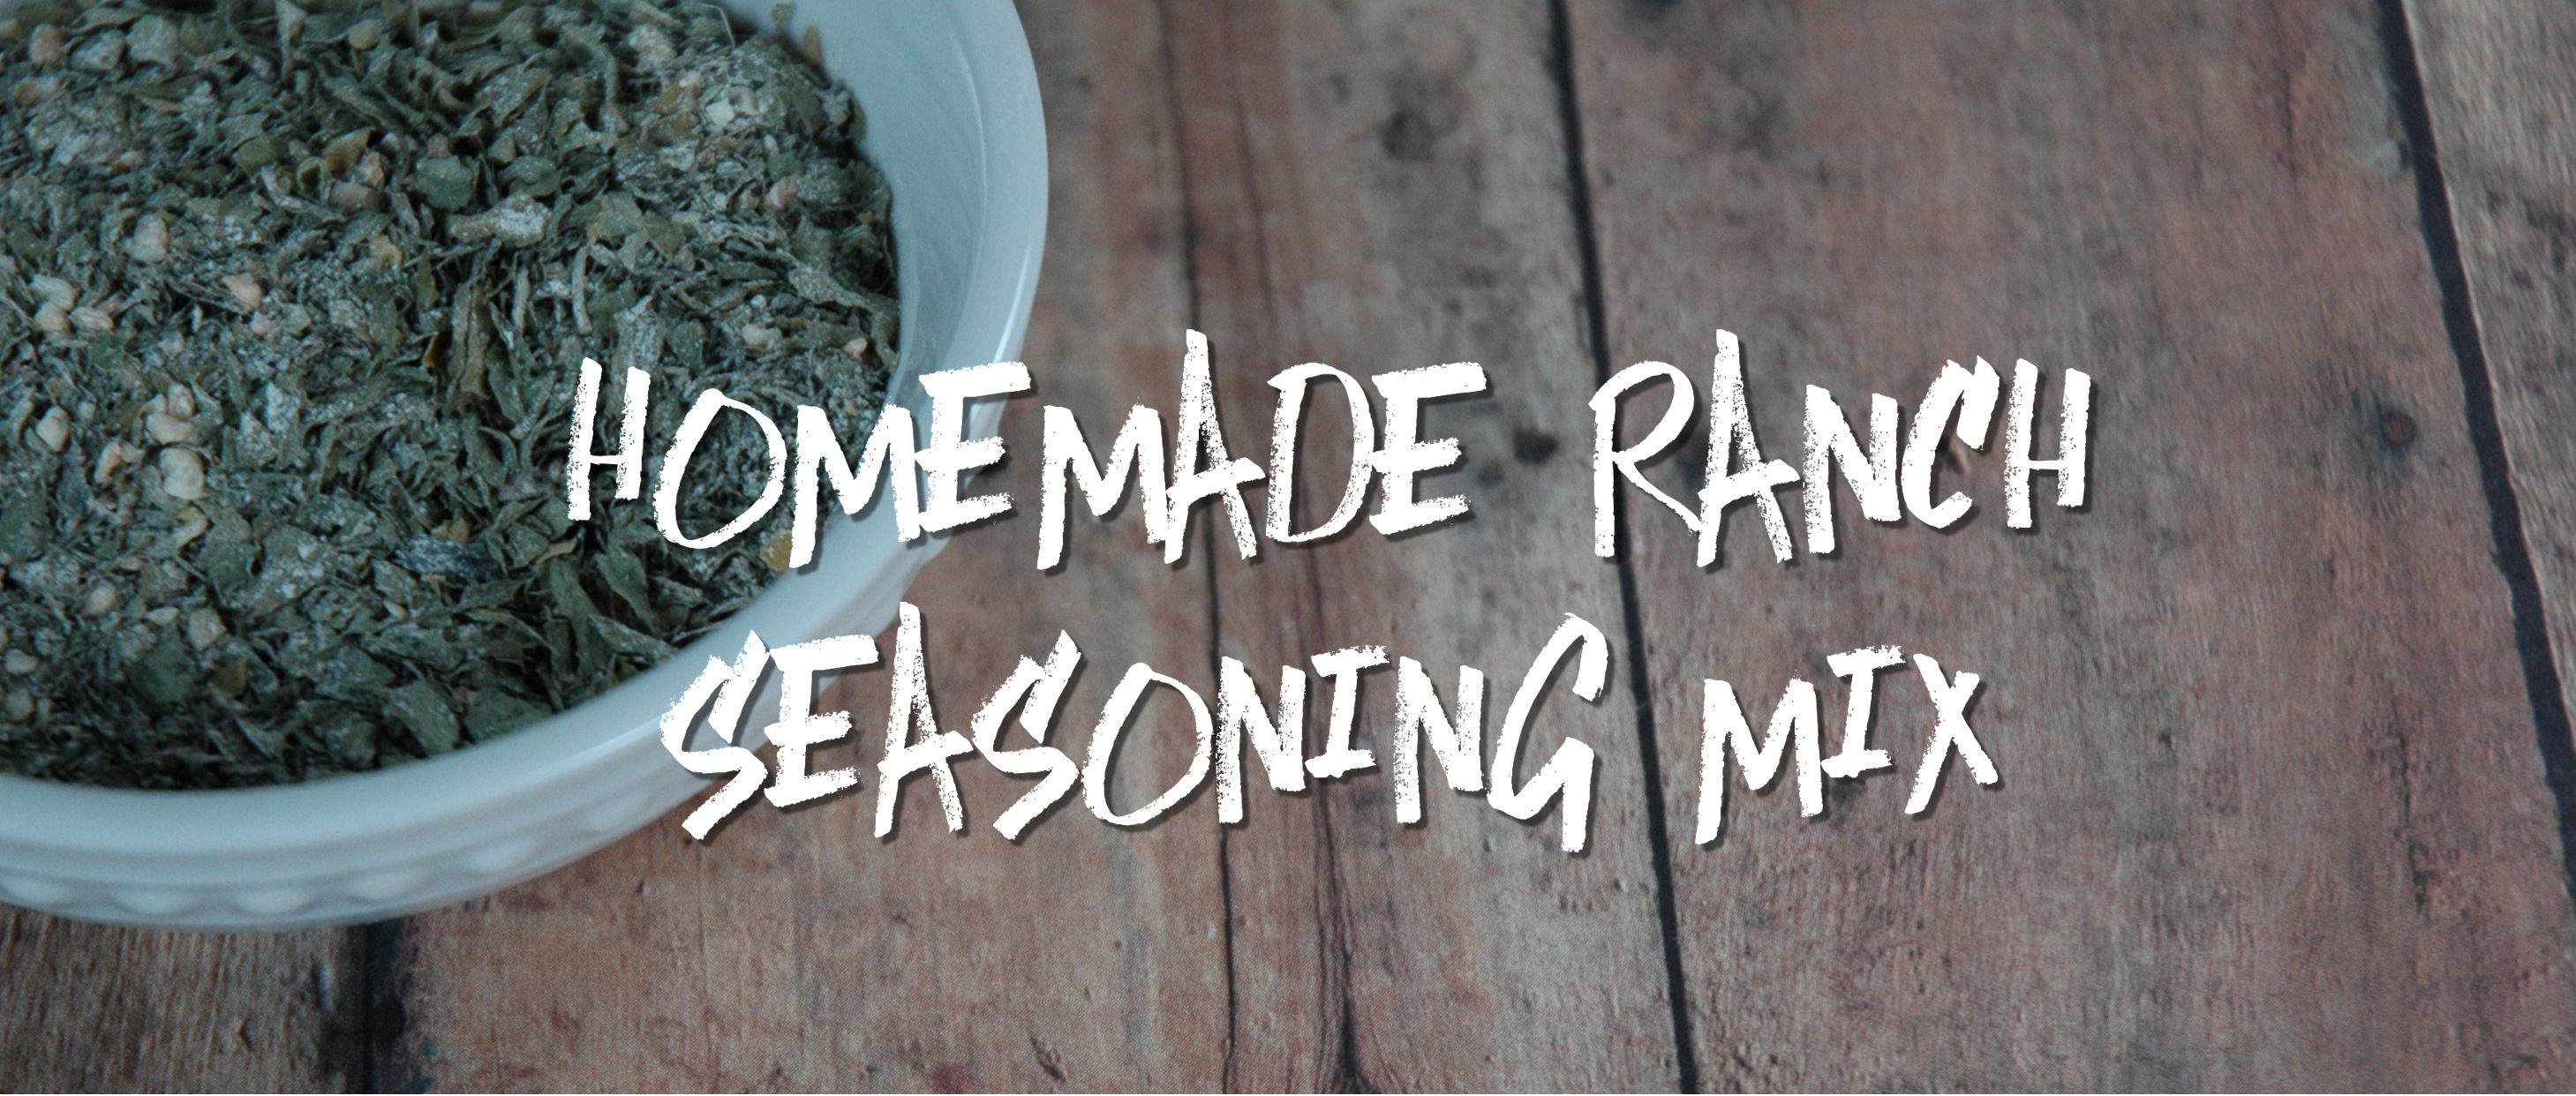 Ranch Seasoning Featured